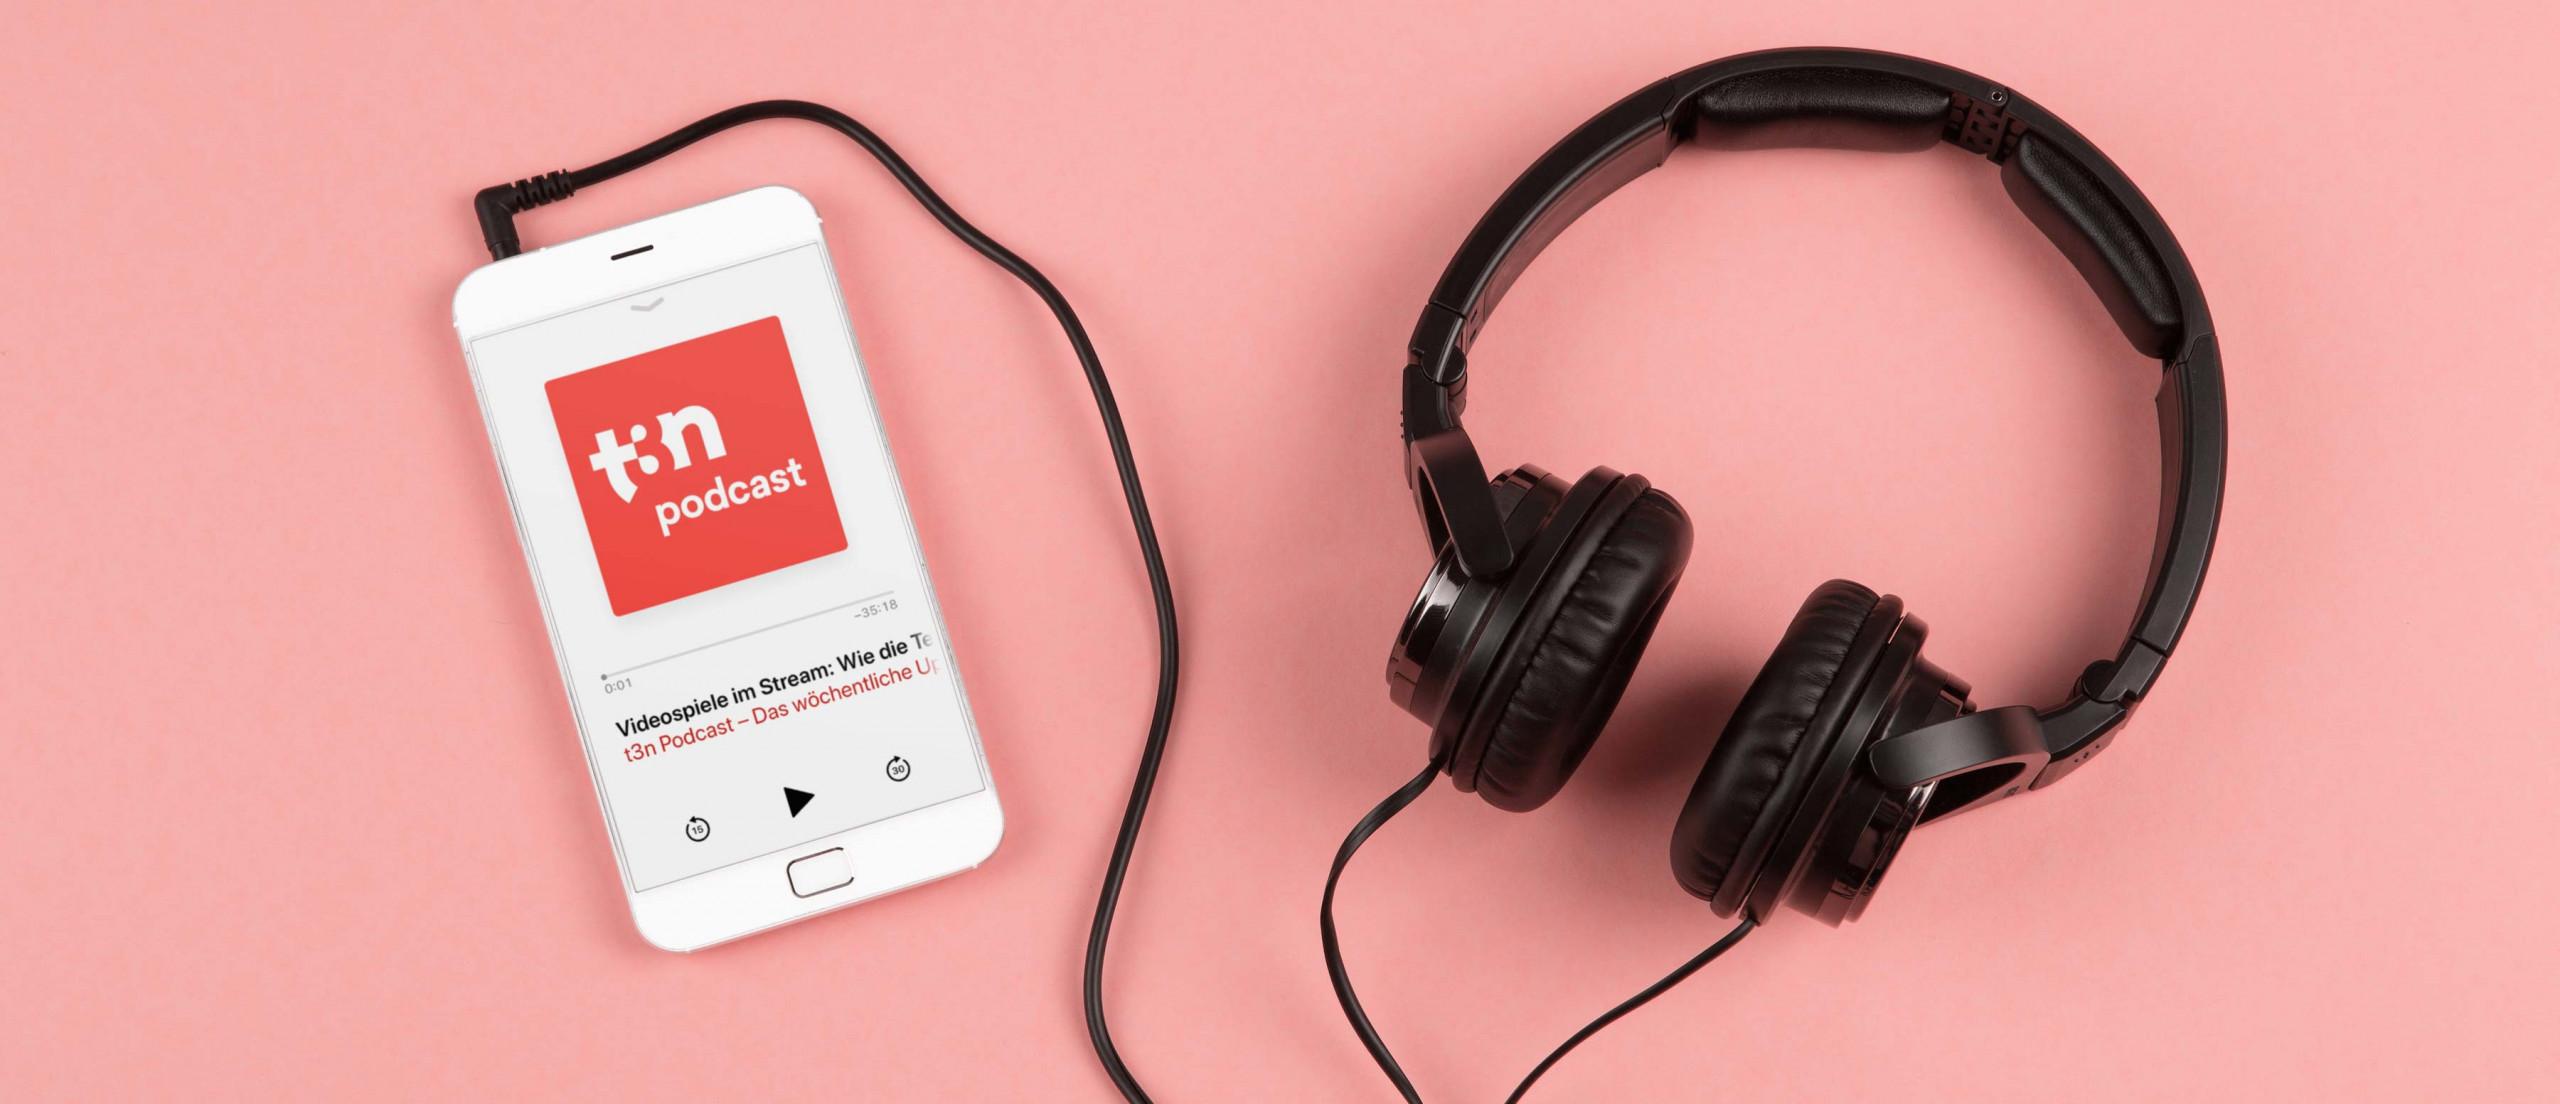 Sponsoring t3n Podcast